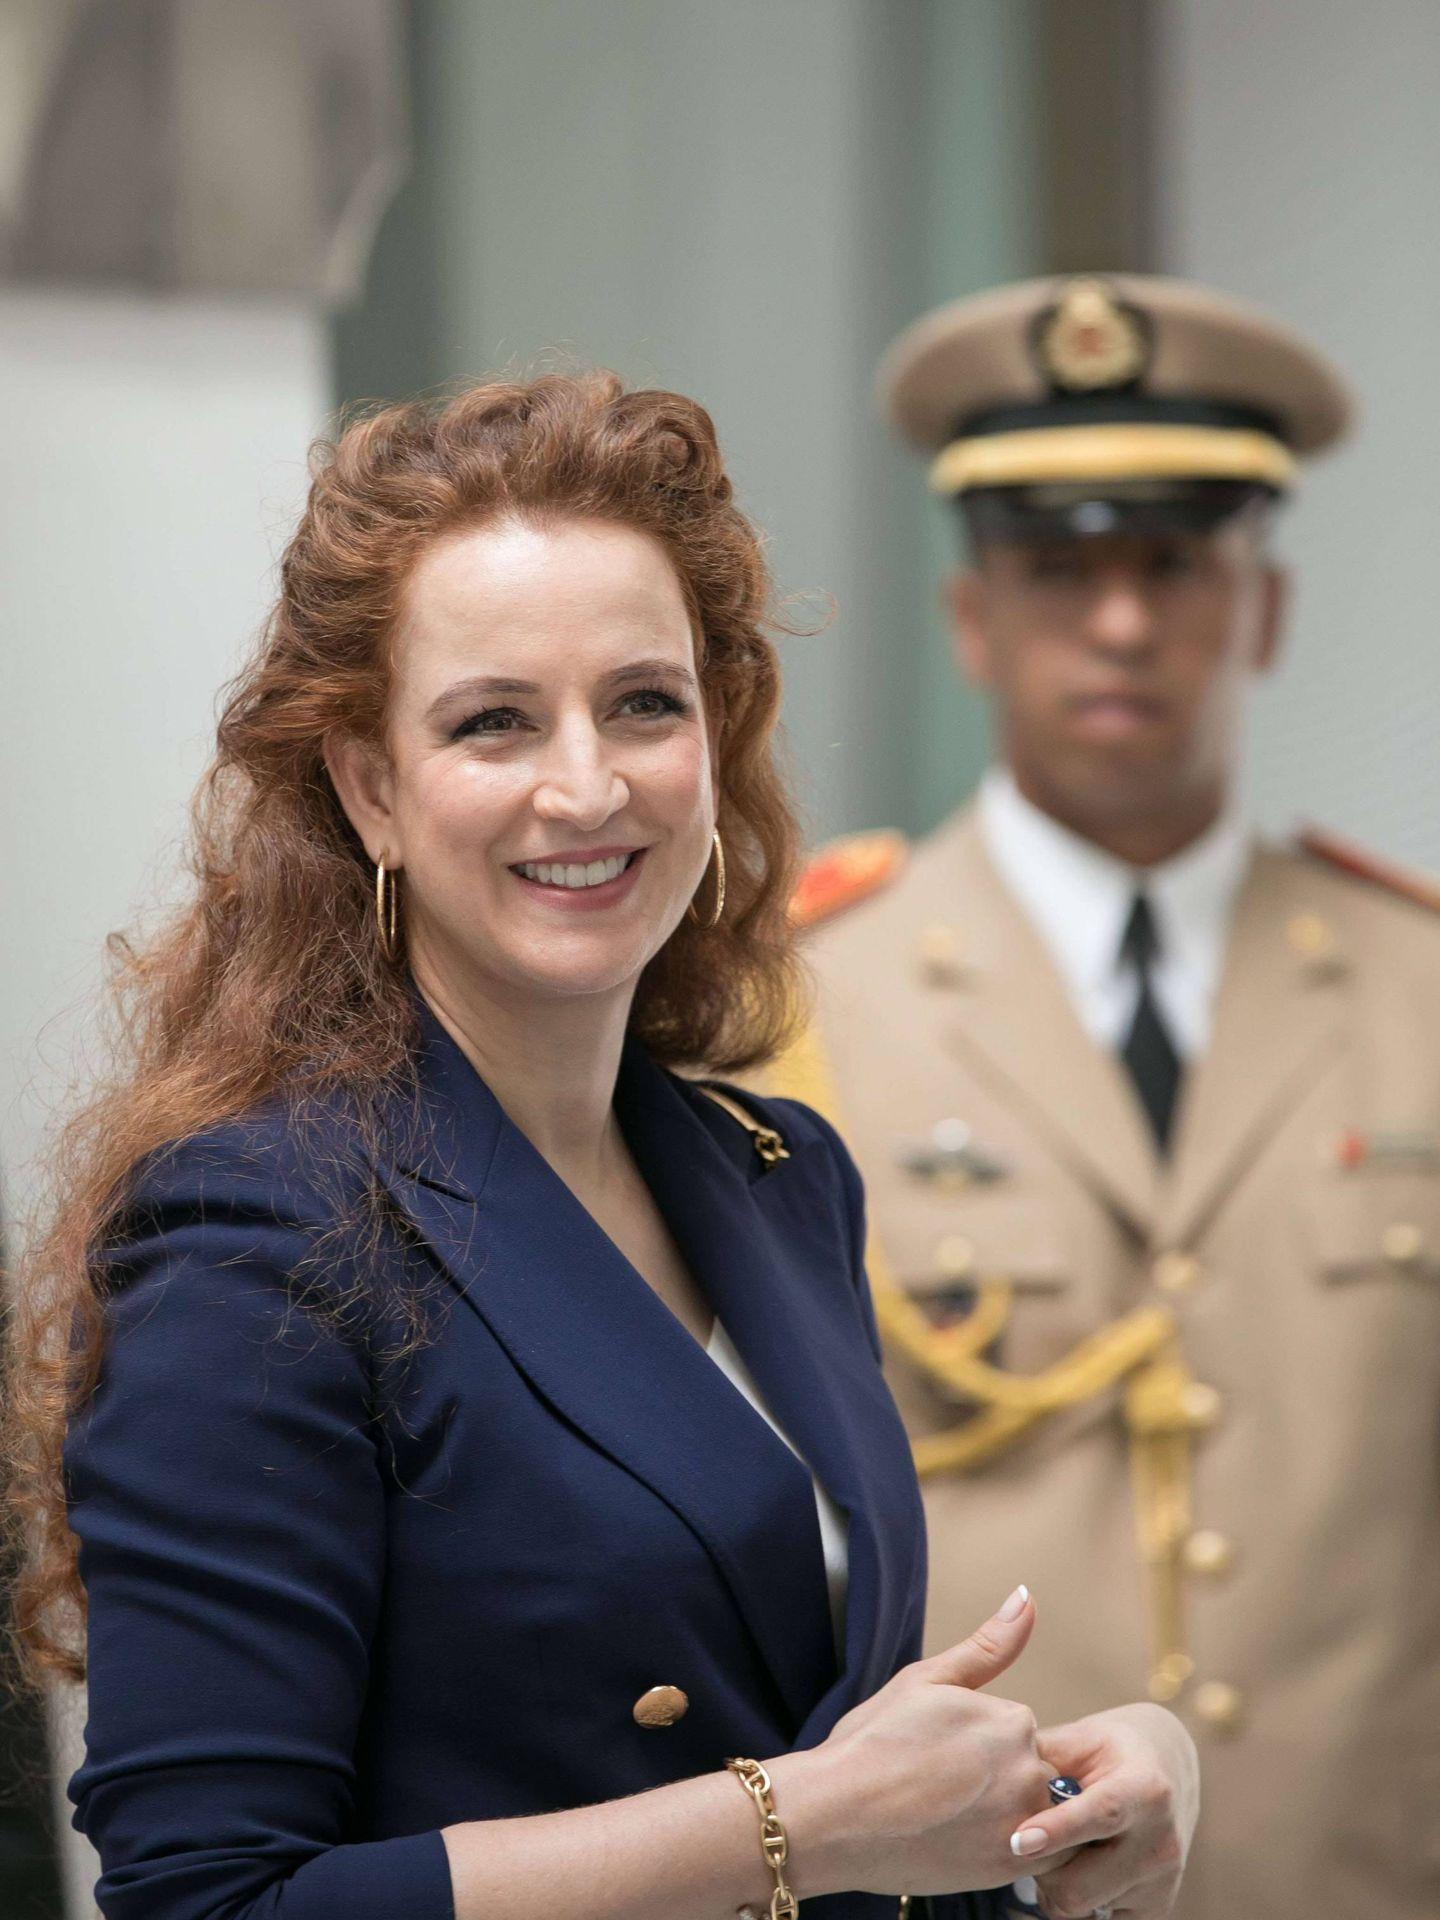 La princesa Lalla Salma, en un acto institucional. (Cordon Press)